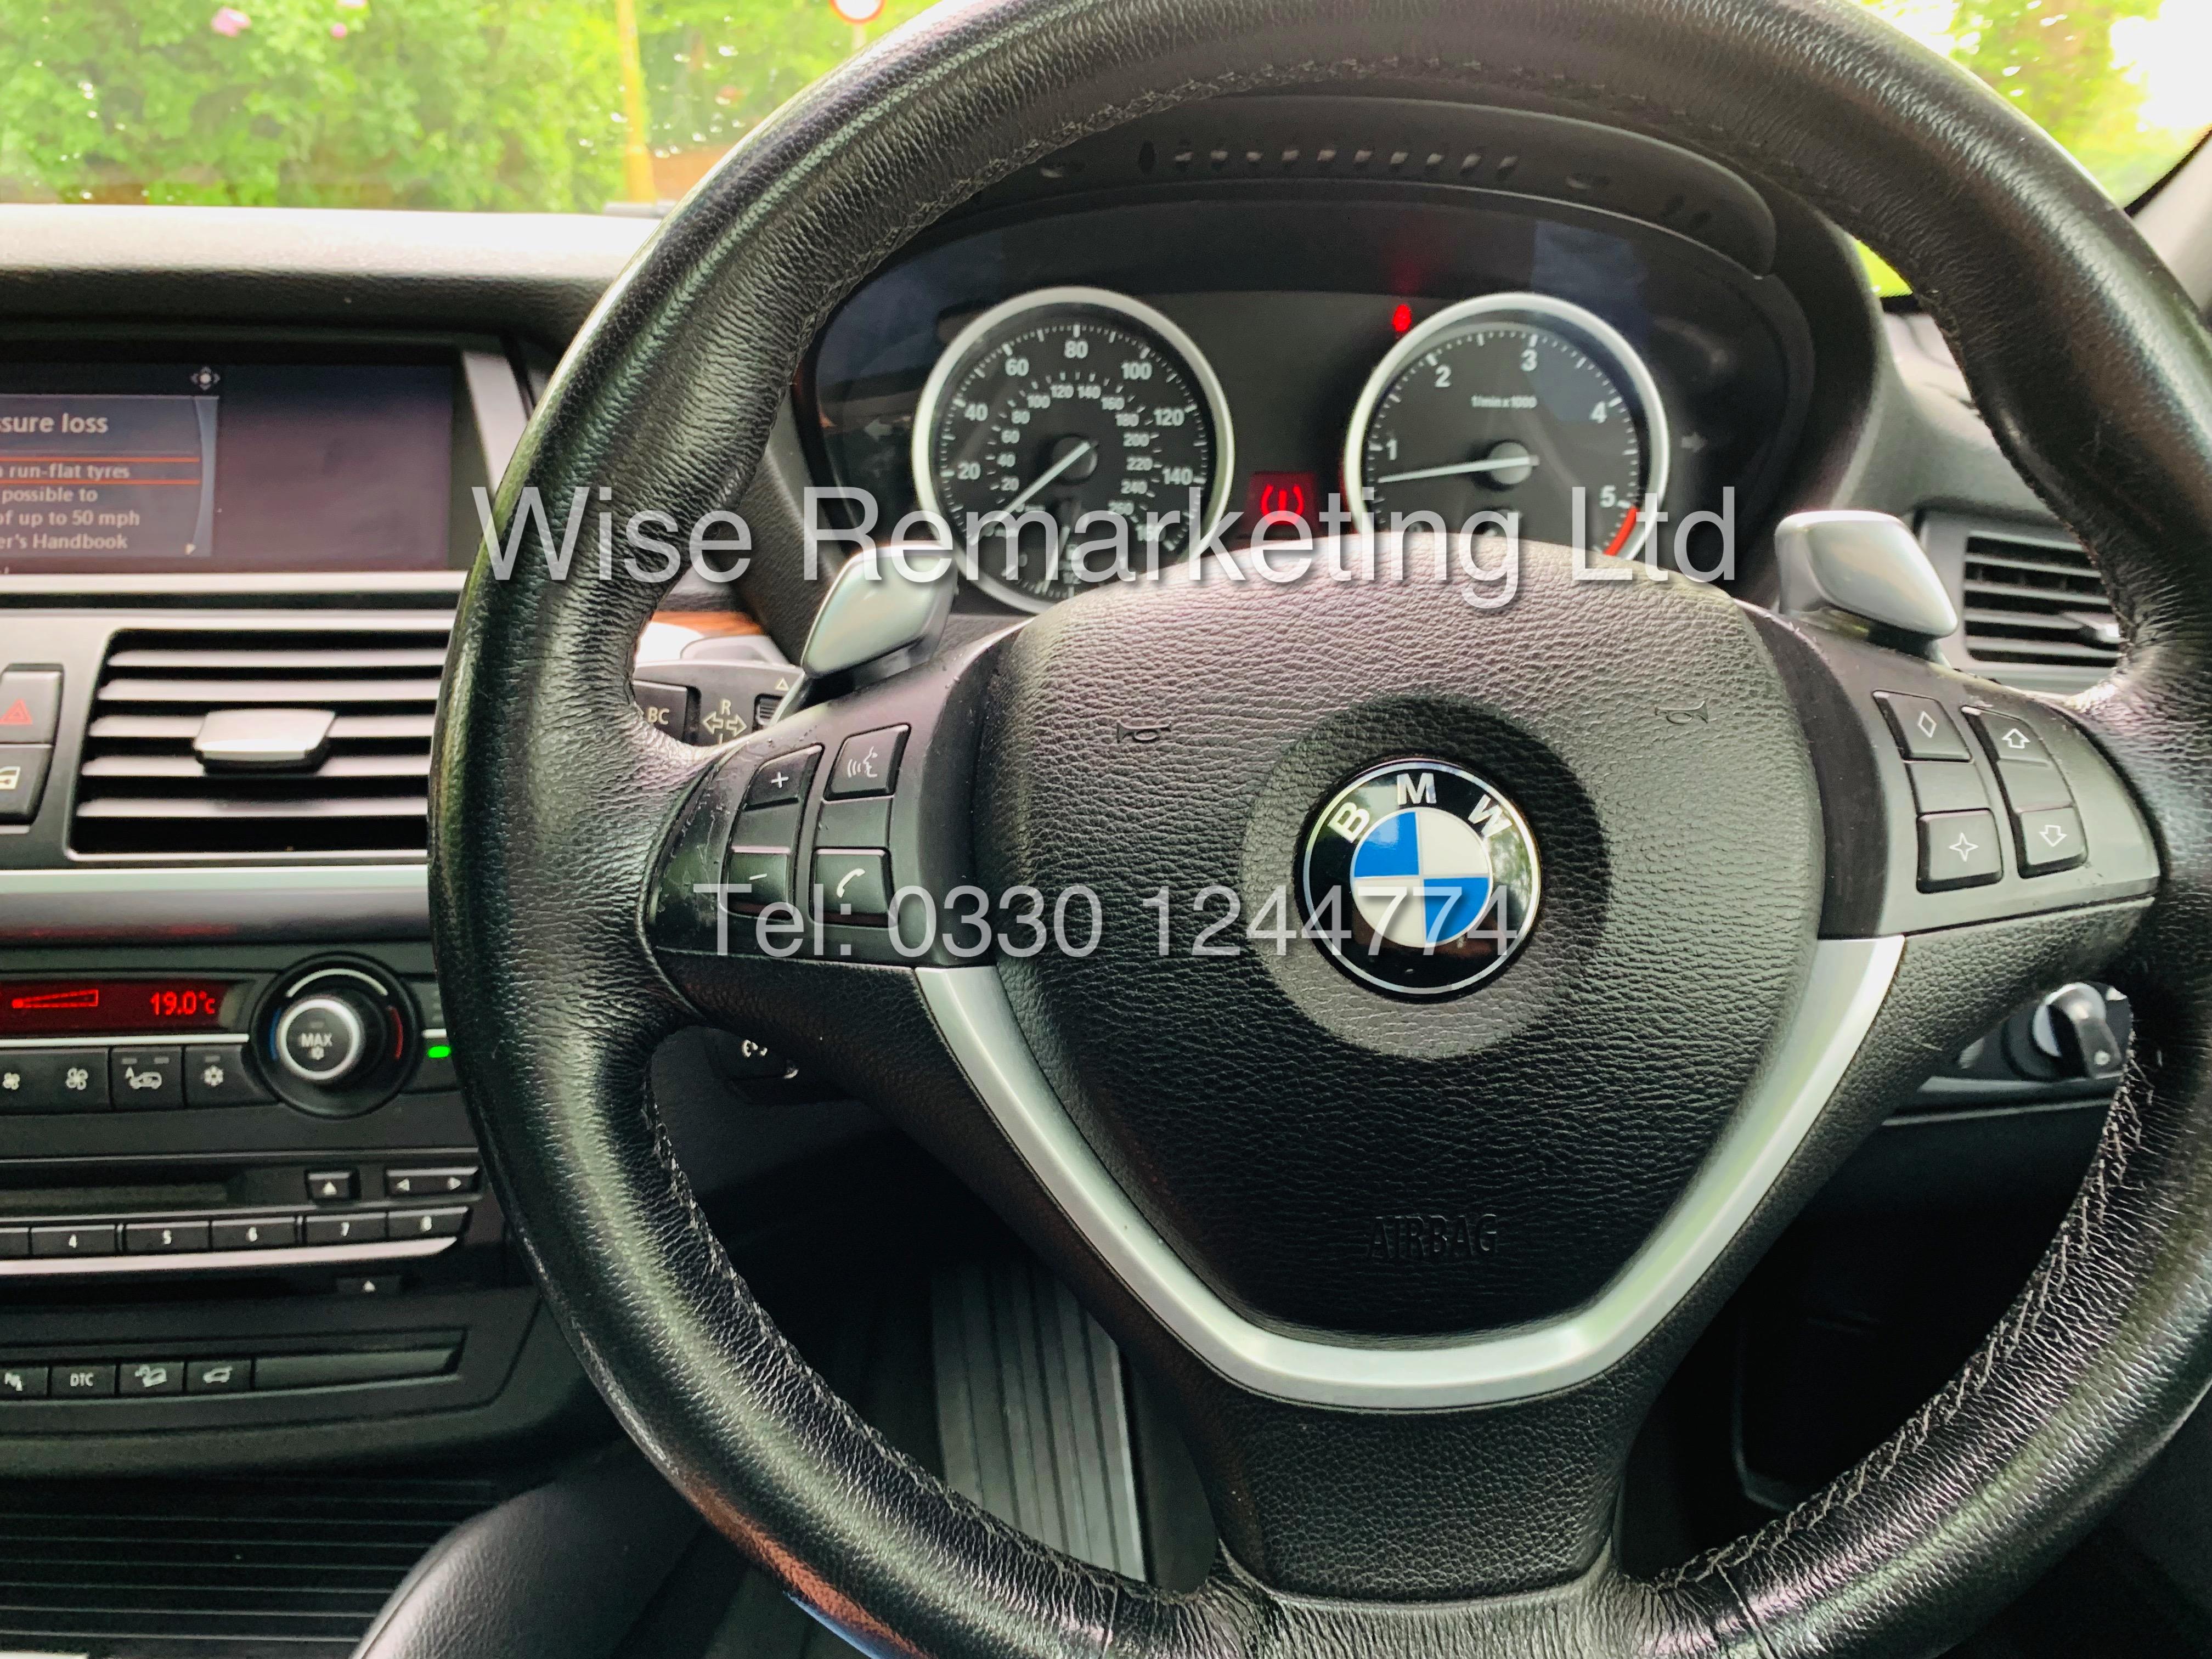 BMW X6 XDRIVE 35D AUTO (2009 SPEC) *1 PREVIOUS OWNER* PARKING AID - SAT NAV - FSH - Image 15 of 25